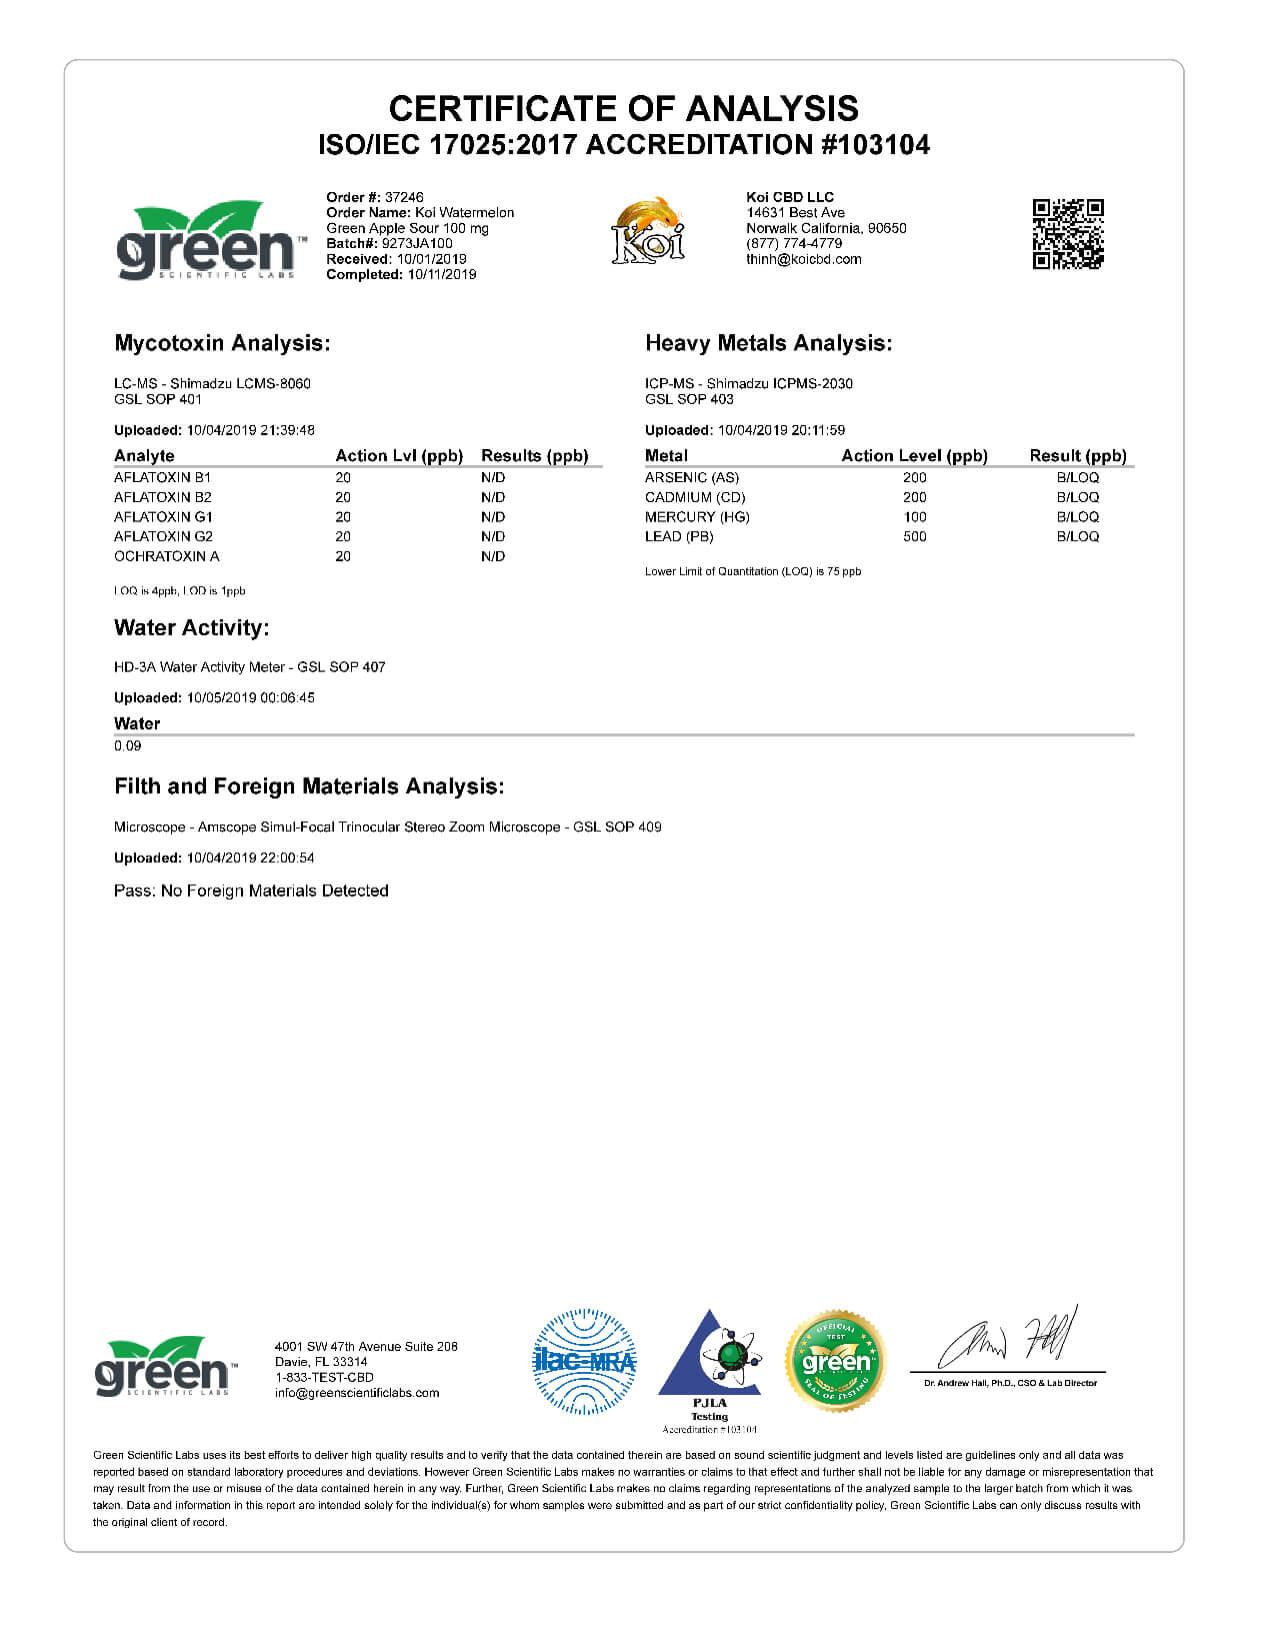 Koi CBD Watermelon Green Apple Sour Vape Oil 100mg page6